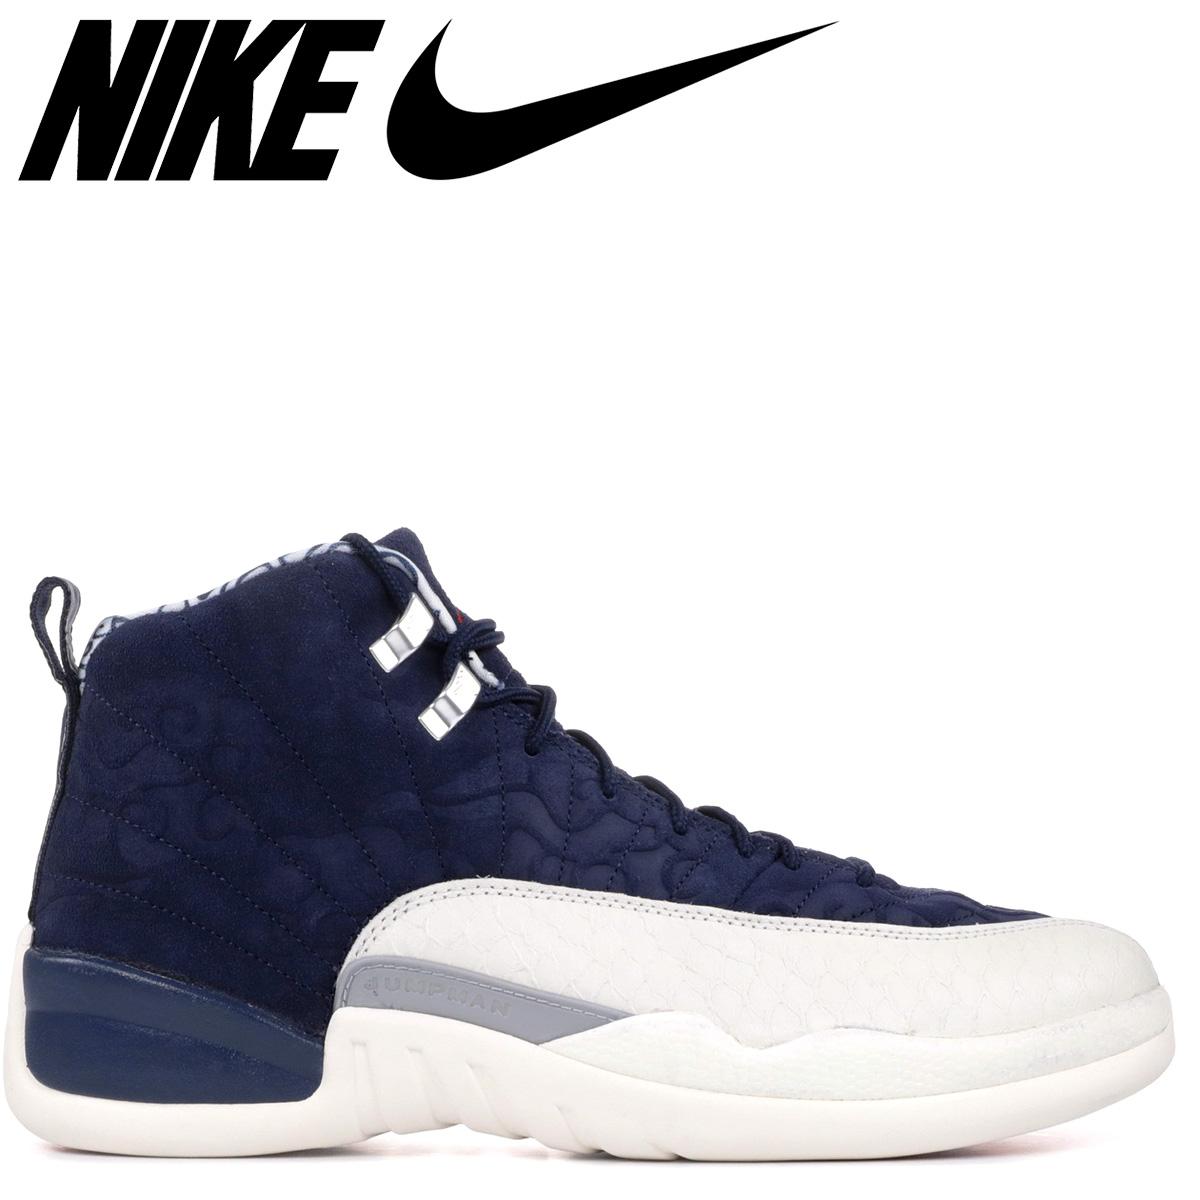 1ec758a096ff NIKE Nike Air Jordan 12 nostalgic sneakers men AIR JORDAN 12 RETRO  INTERNATIONAL FLIGHT BV8016-445 navy  load planned Shinnyu load in  reservation product ...